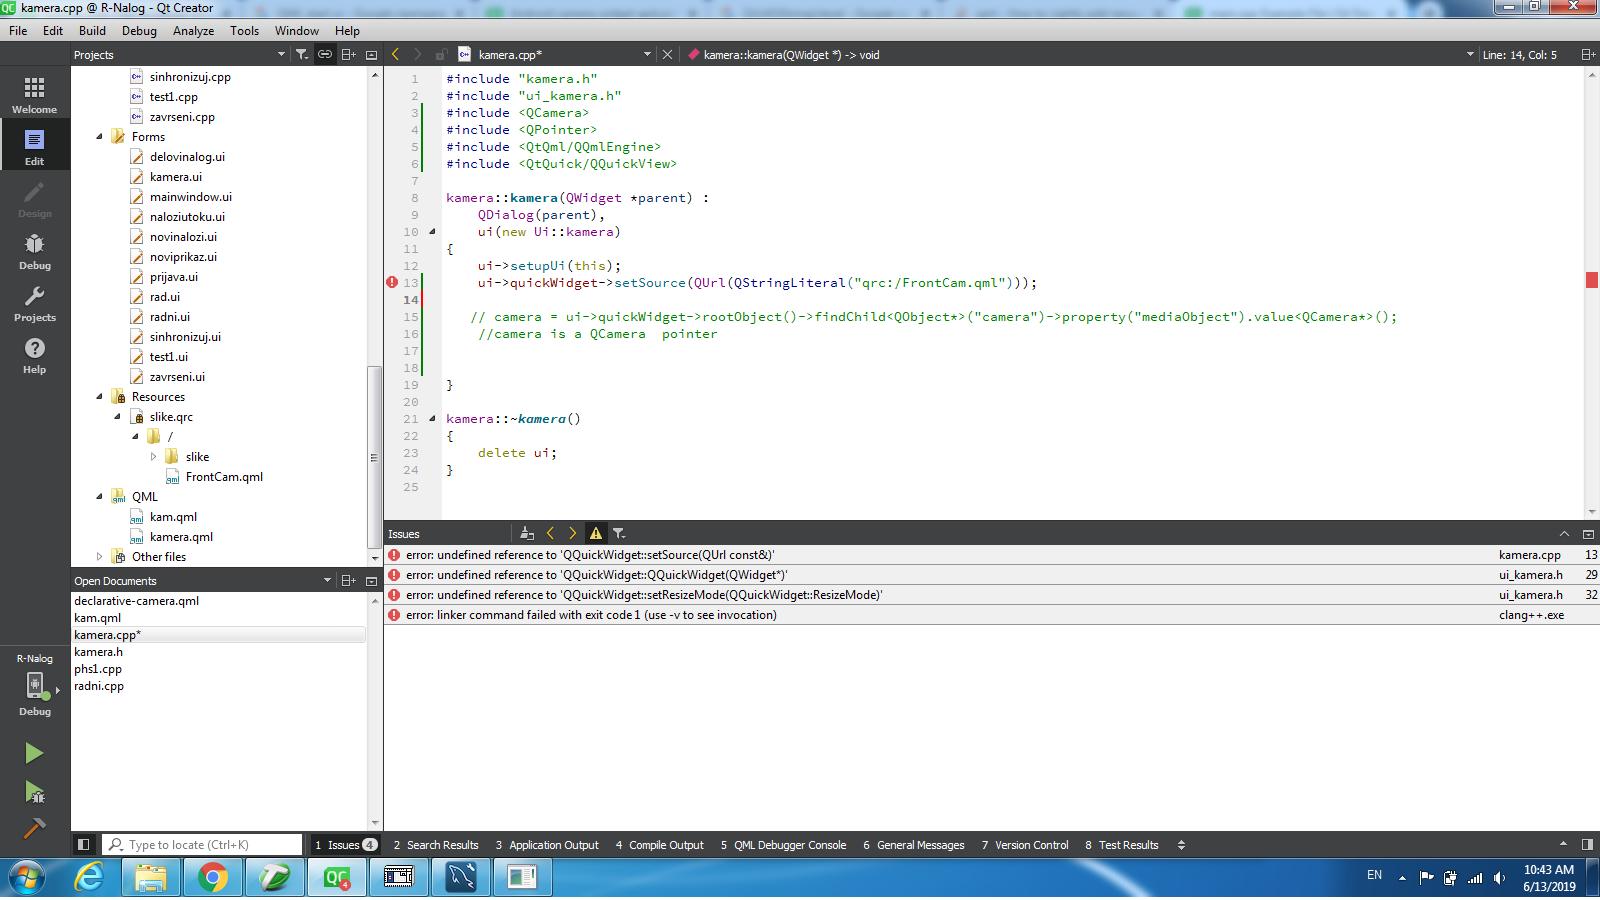 0_1560415629759_problem.png